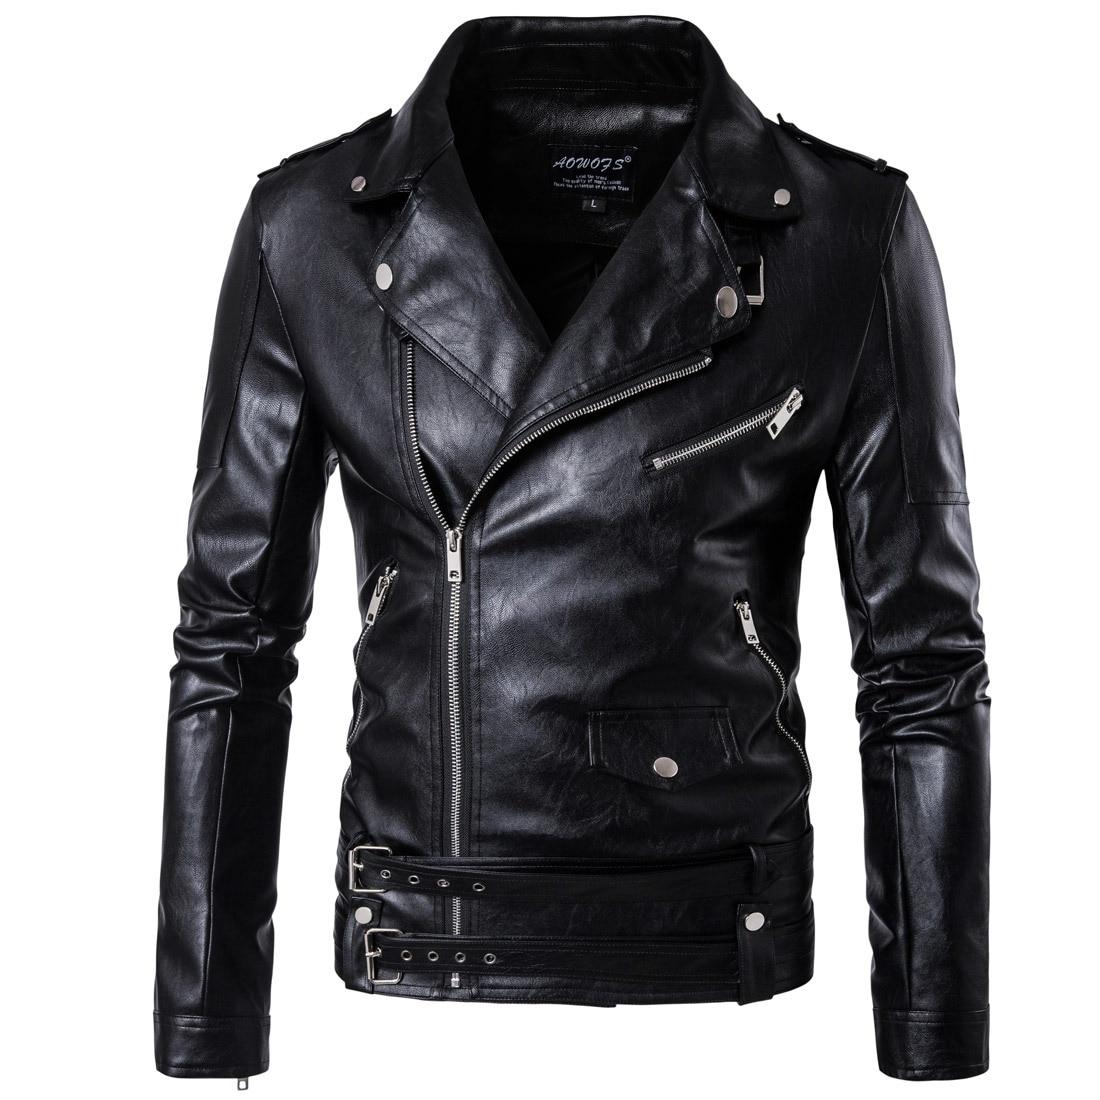 2017 PU Leather Black Jackets For Men Short Cool Best ...